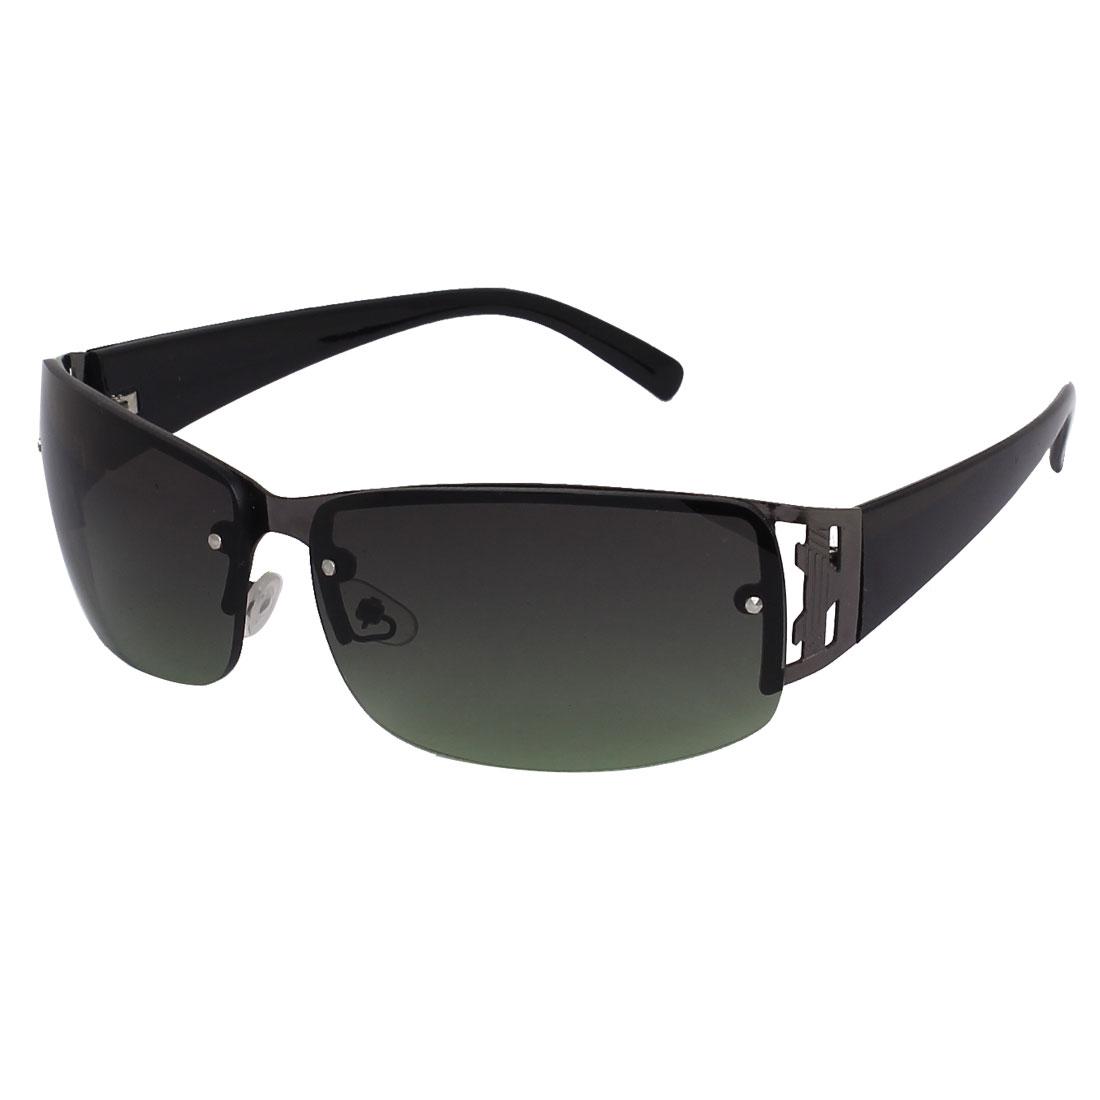 Men Rectangle Frame Single Nose Bridge Sunglasses Glasses Eyewear Eyes Protection Green